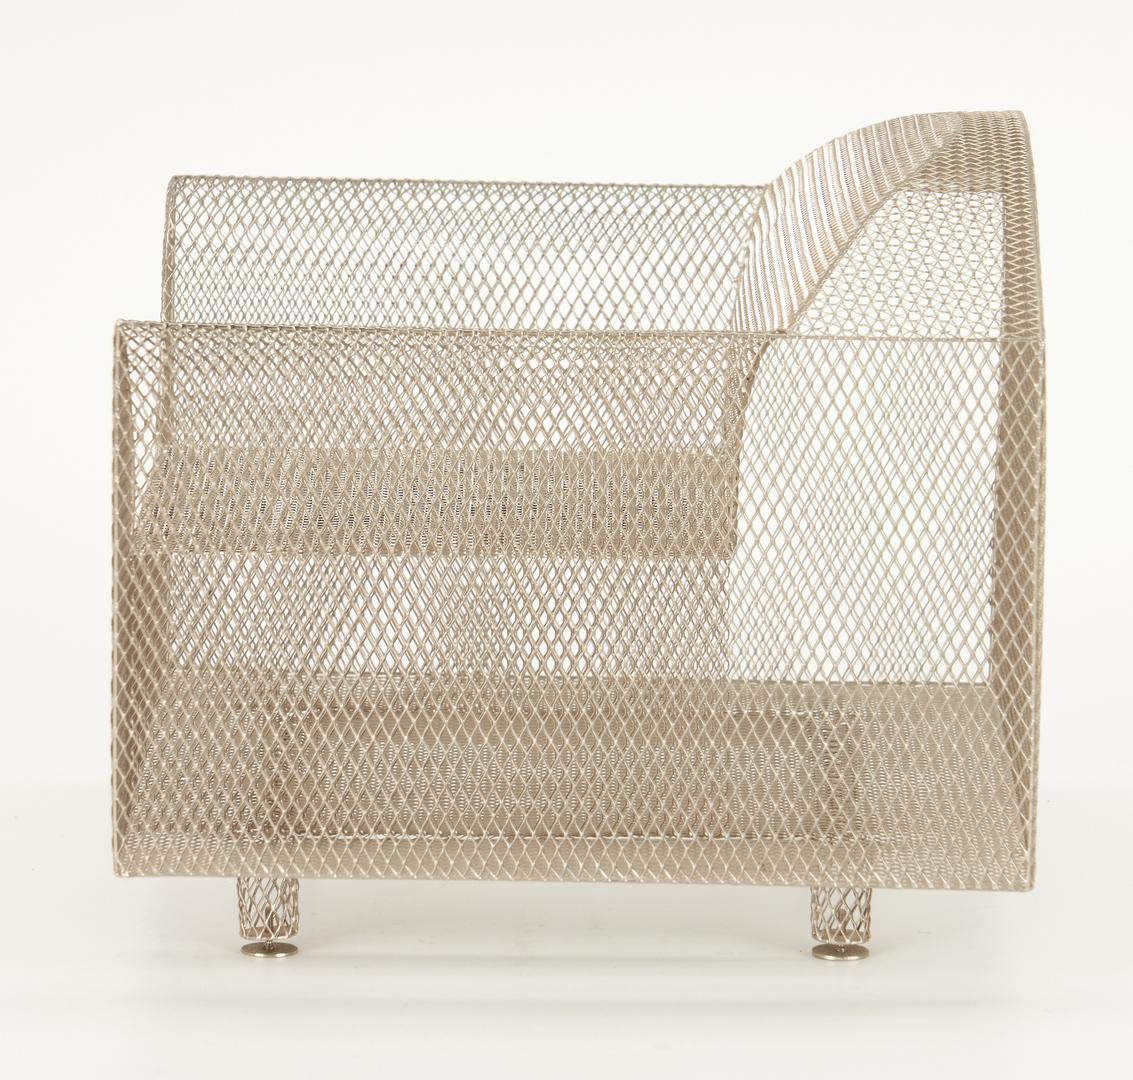 Lot 895: Shiro Kuramata Miniature Chair, How High the Moon